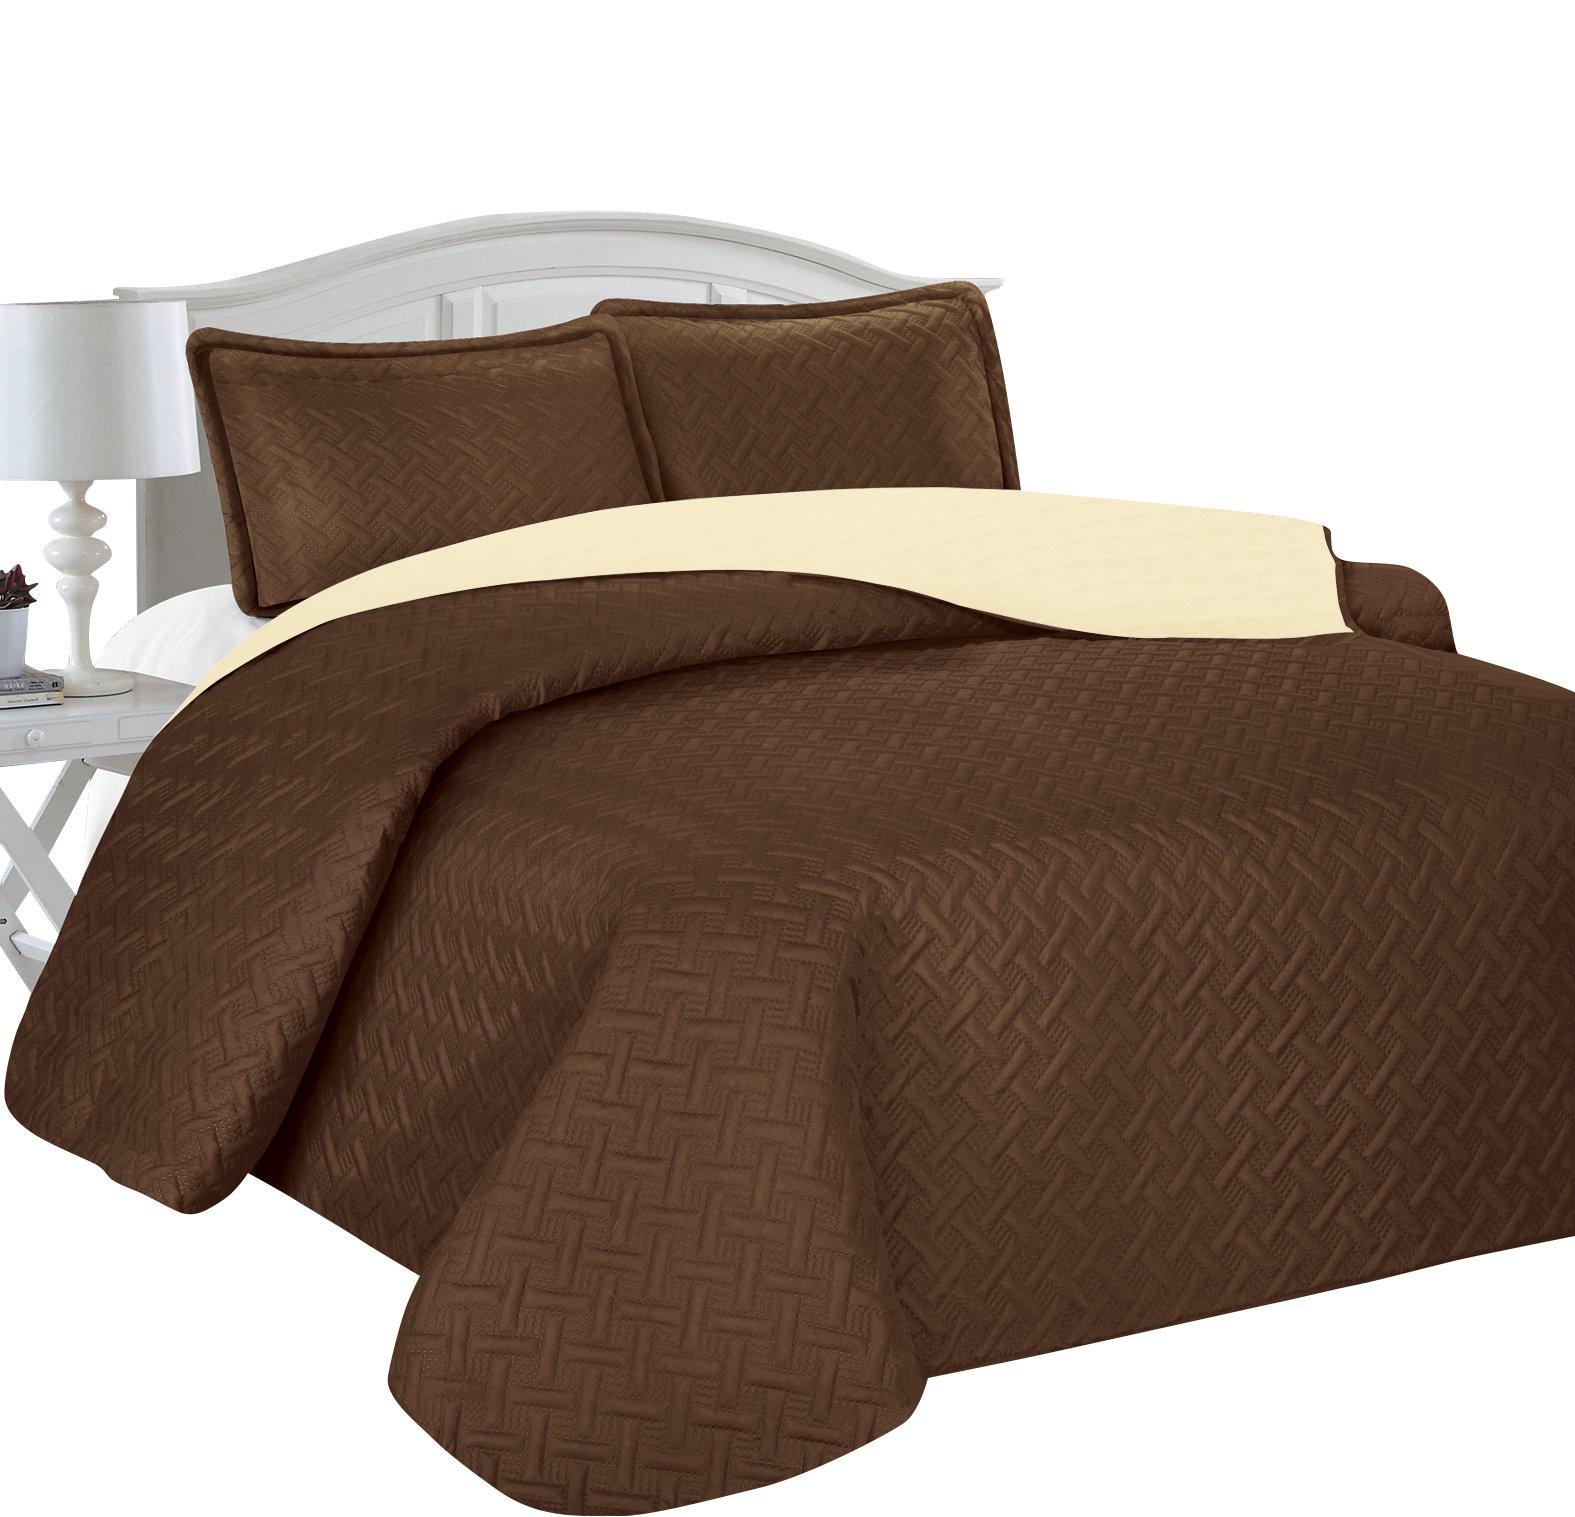 Home Sweet Home Victoria Design Reversible 3 PC Quilt Bedspread Sets (King, Brown/Beige)